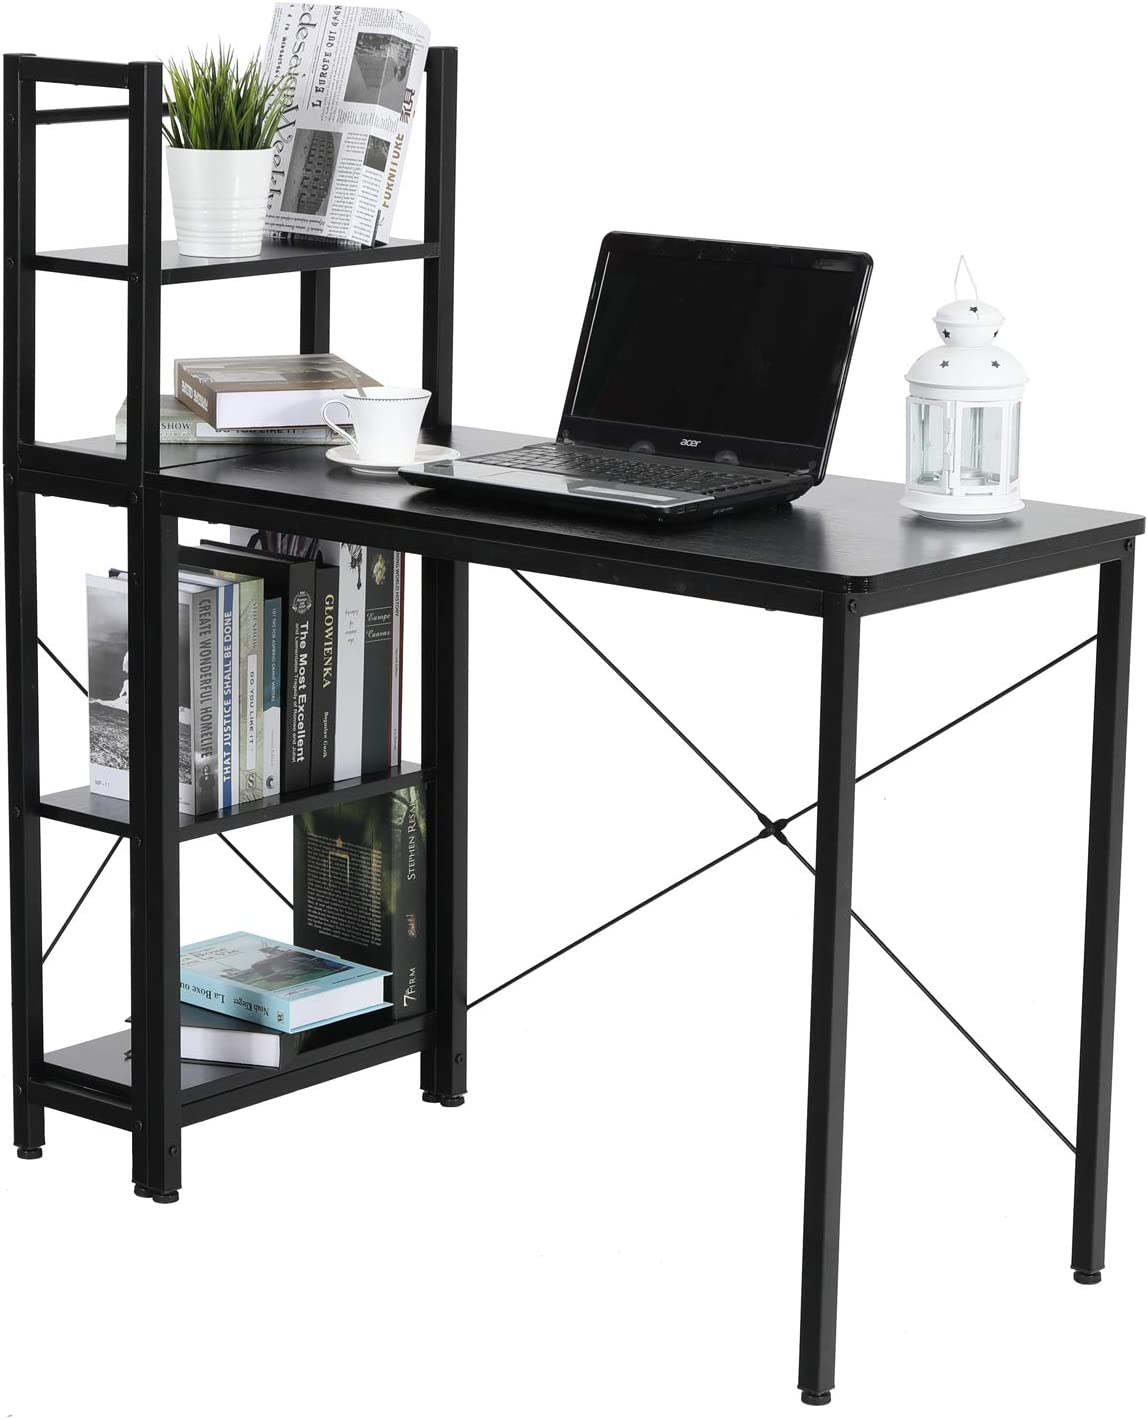 ALPHA HOME Computer Desk and Bookshelf, Wood Grain Office Desk PC Laptop Table Workstation